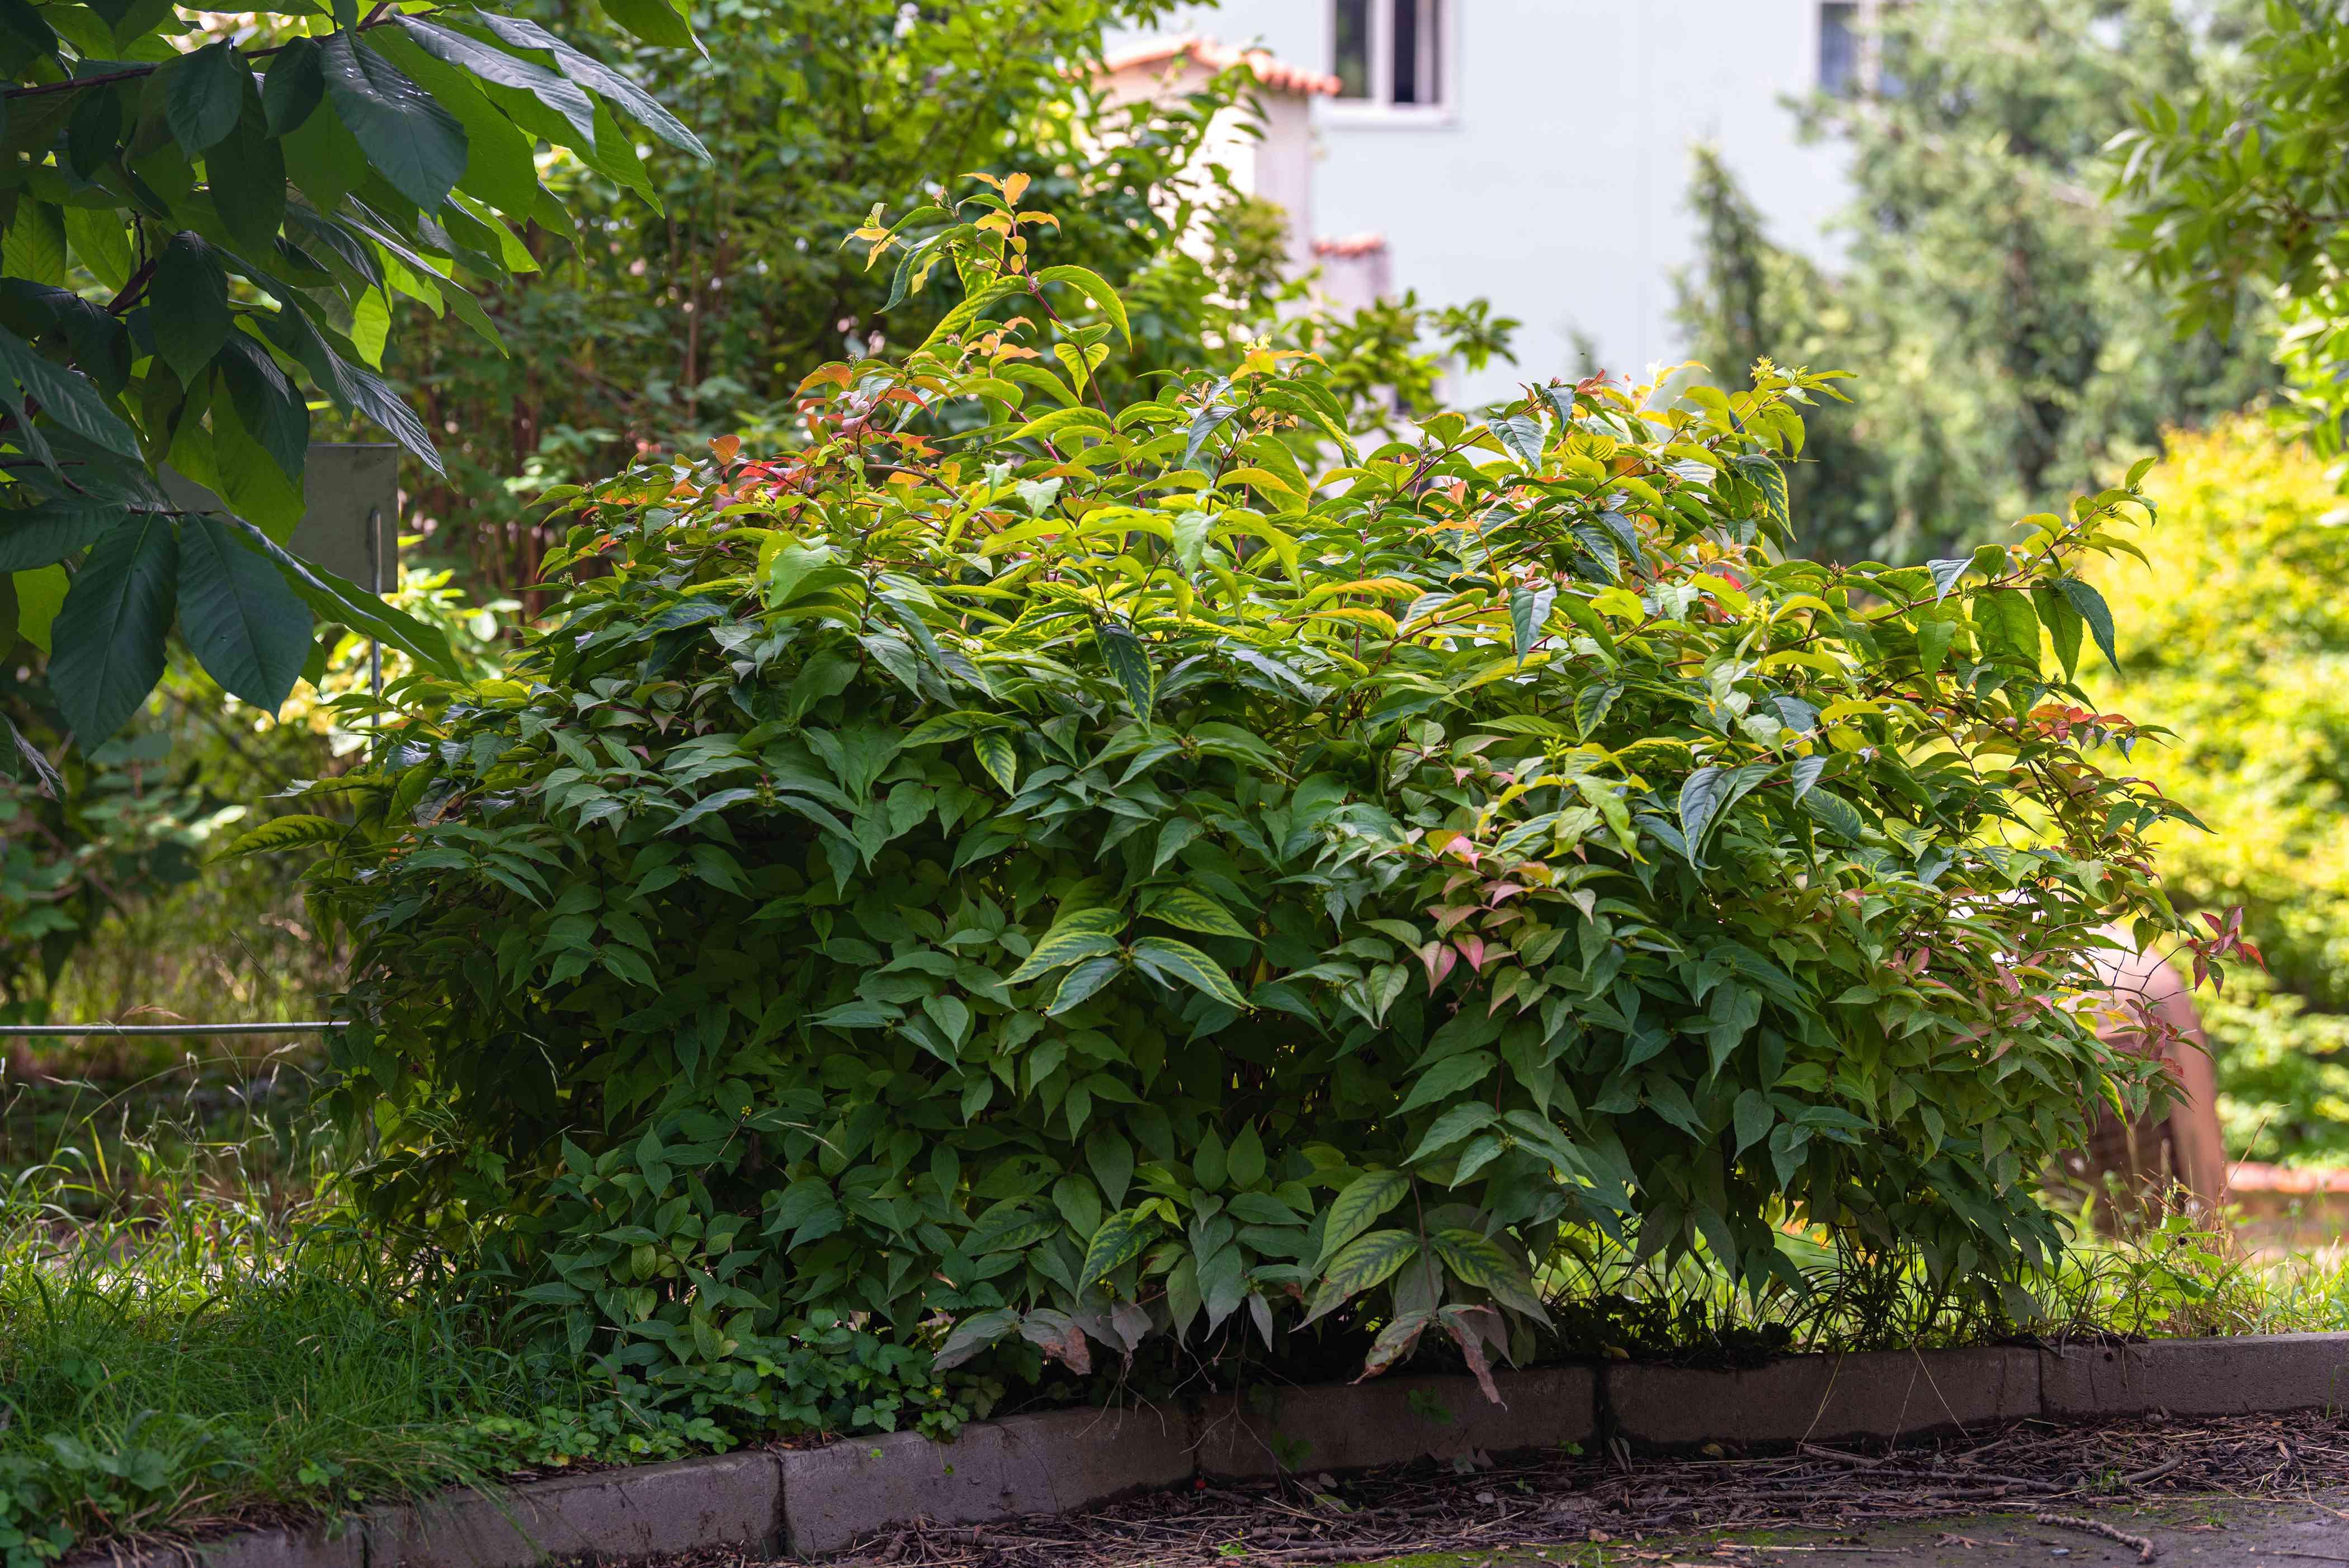 Northern bush honeysuckle shrub with dense thickets on edge of yard